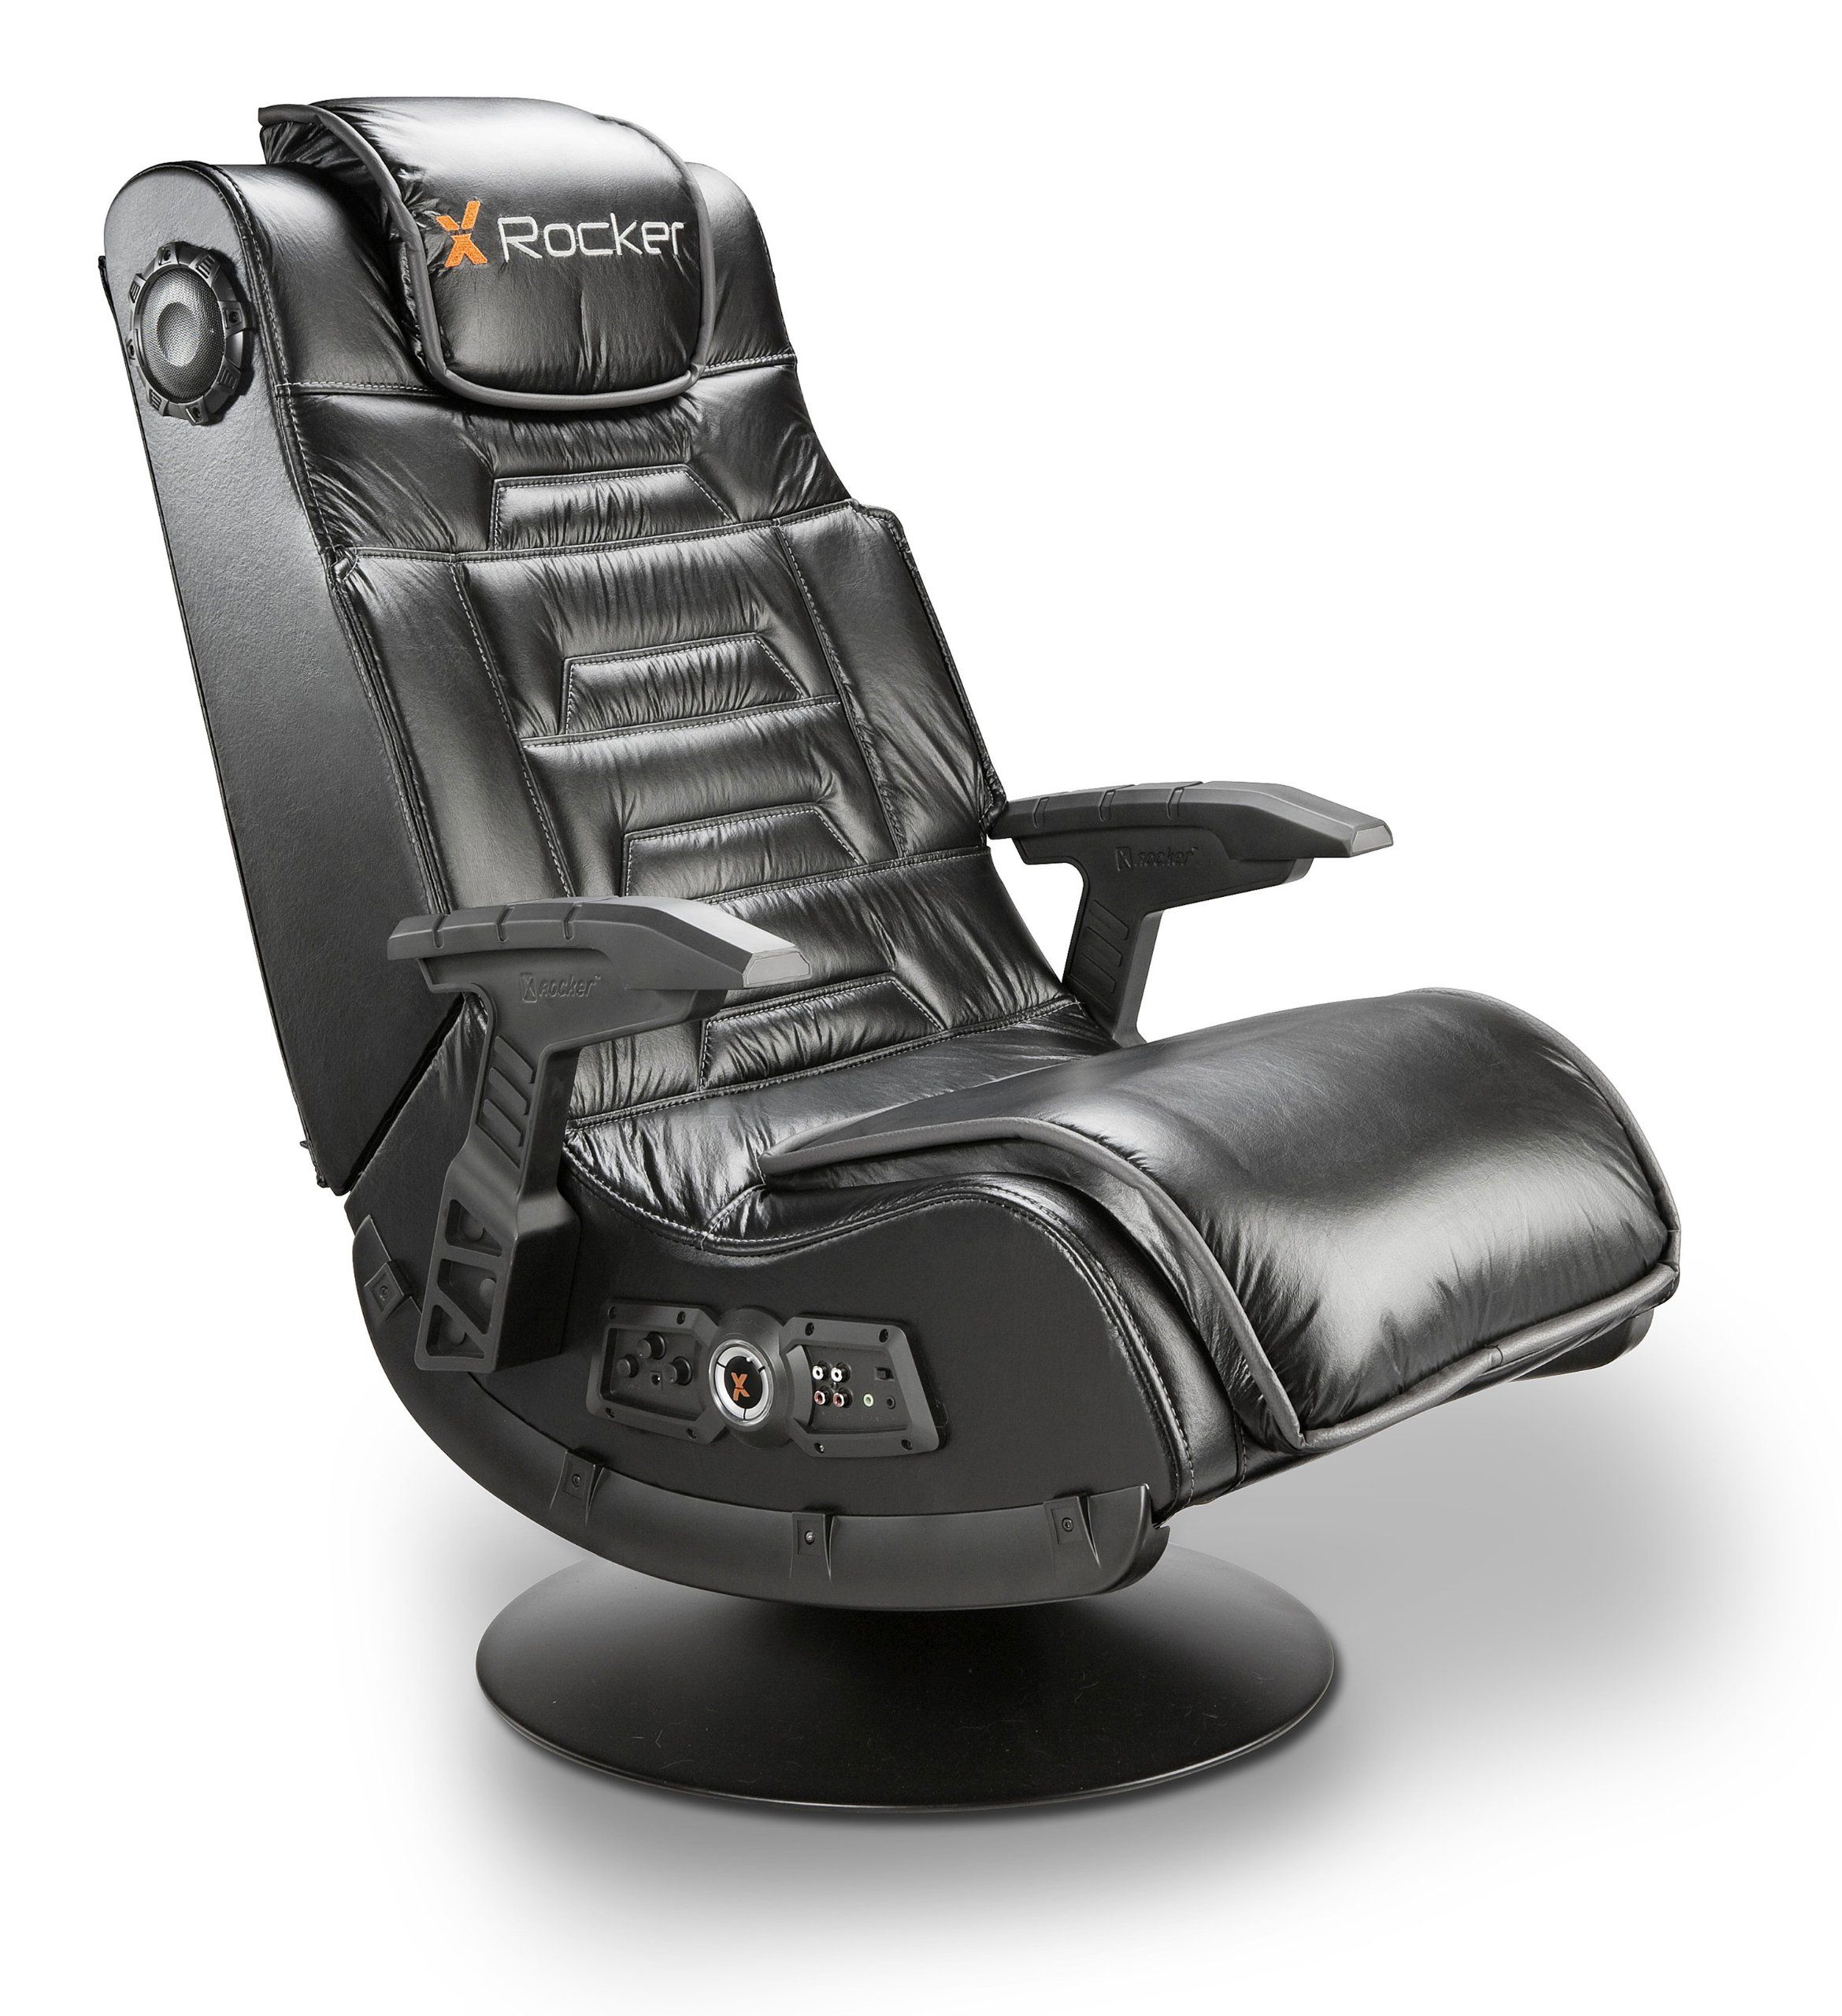 Incredible X Rocker 51396 Pro Series Pedestal 2 1 Video Gaming Chair Creativecarmelina Interior Chair Design Creativecarmelinacom